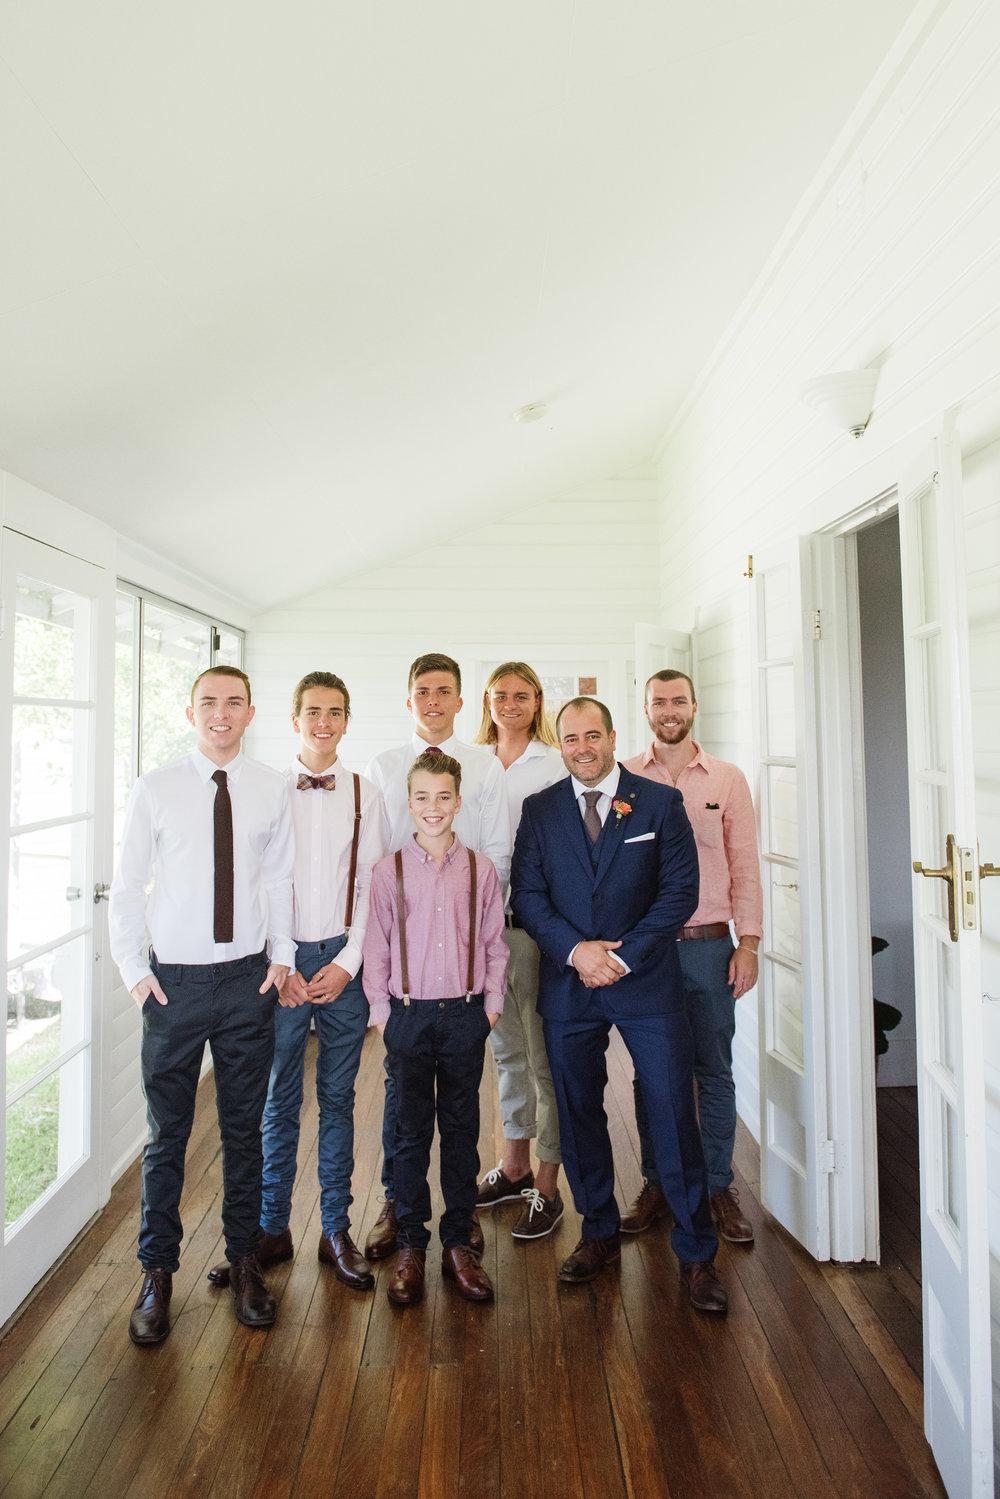 Renee and Matt- wedding photographer, byron bay wedding and family photographer, tweed heads wedding and family photography-103.jpg